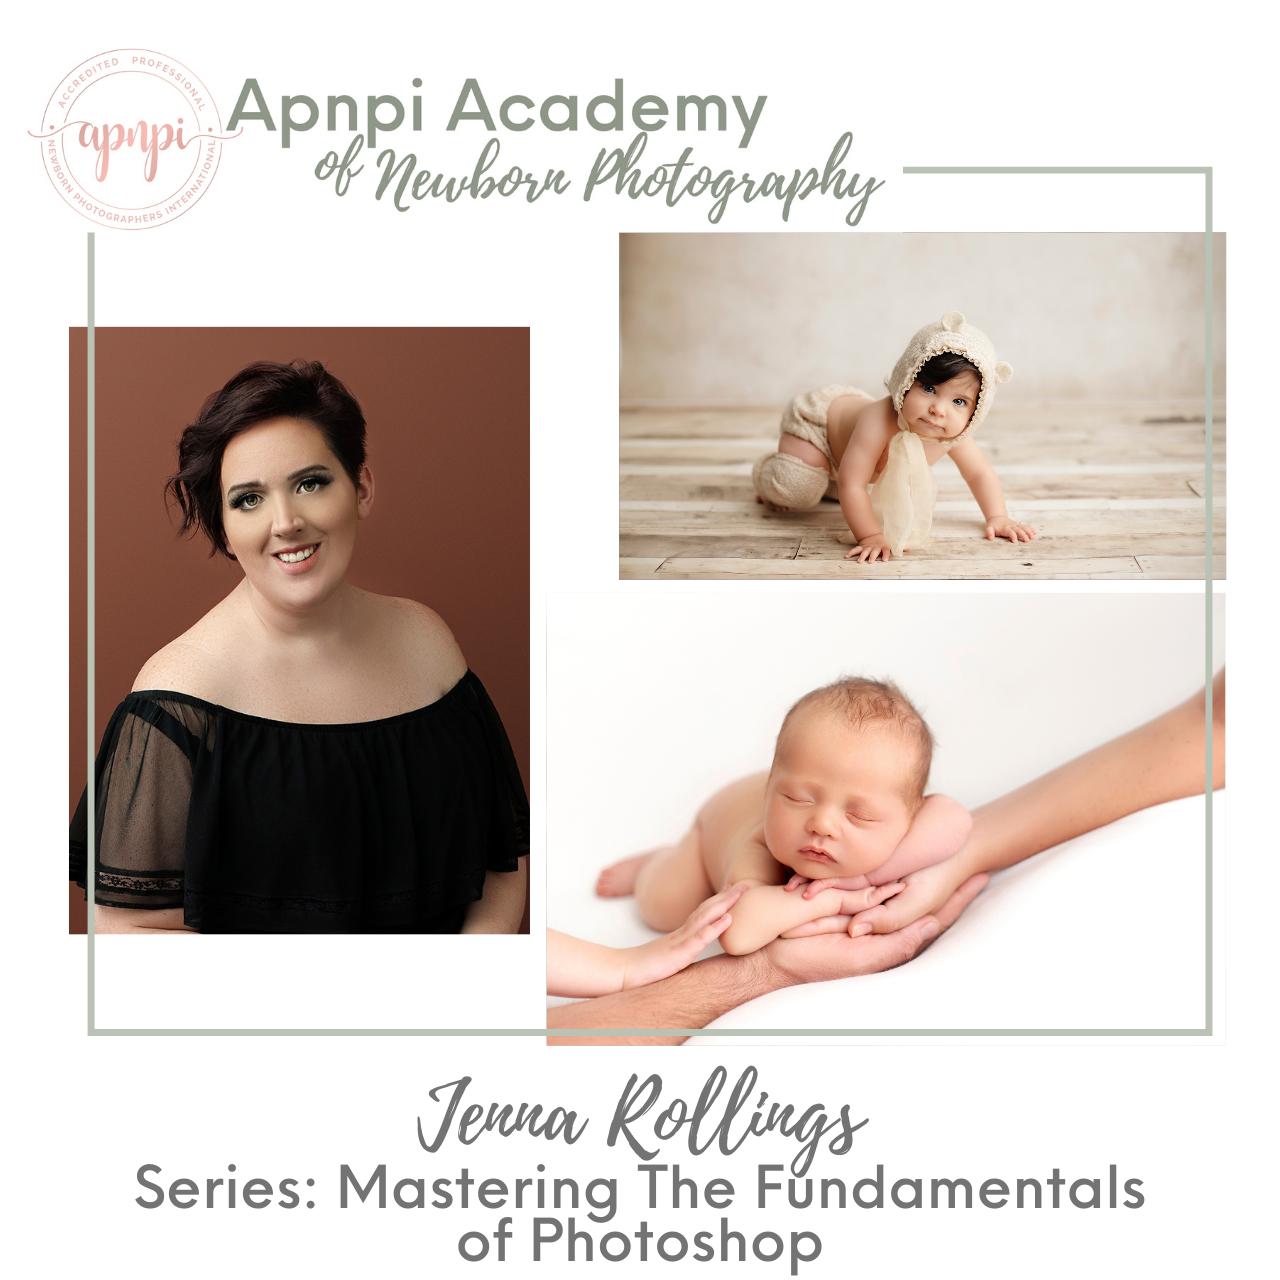 Jenna Rollings Mastering Photoshop for Newborn Photography APNPI Academy Course